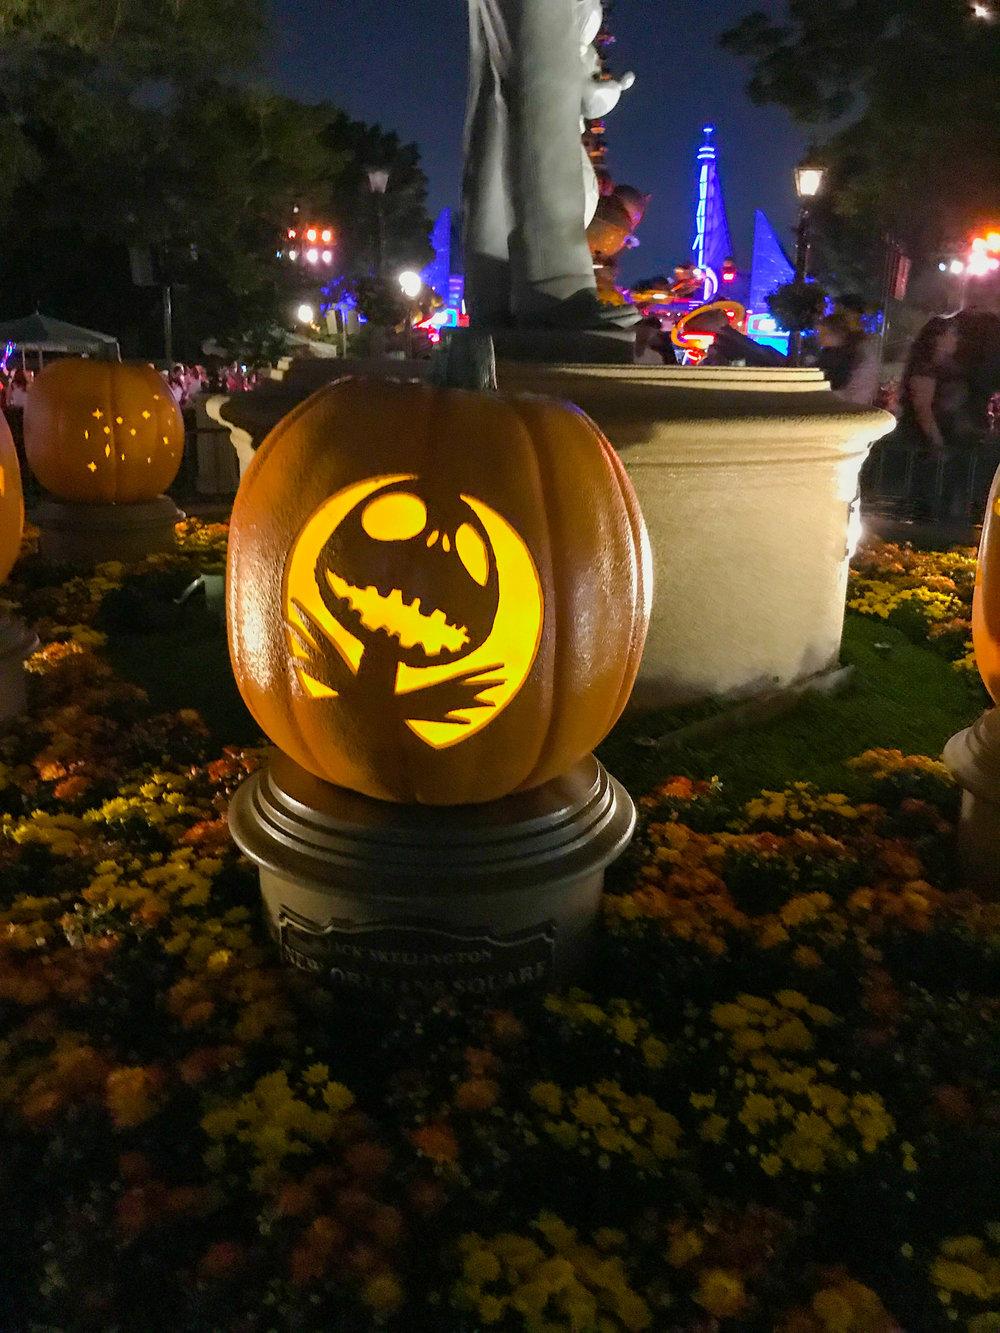 Disneyland Pumpkin Carving